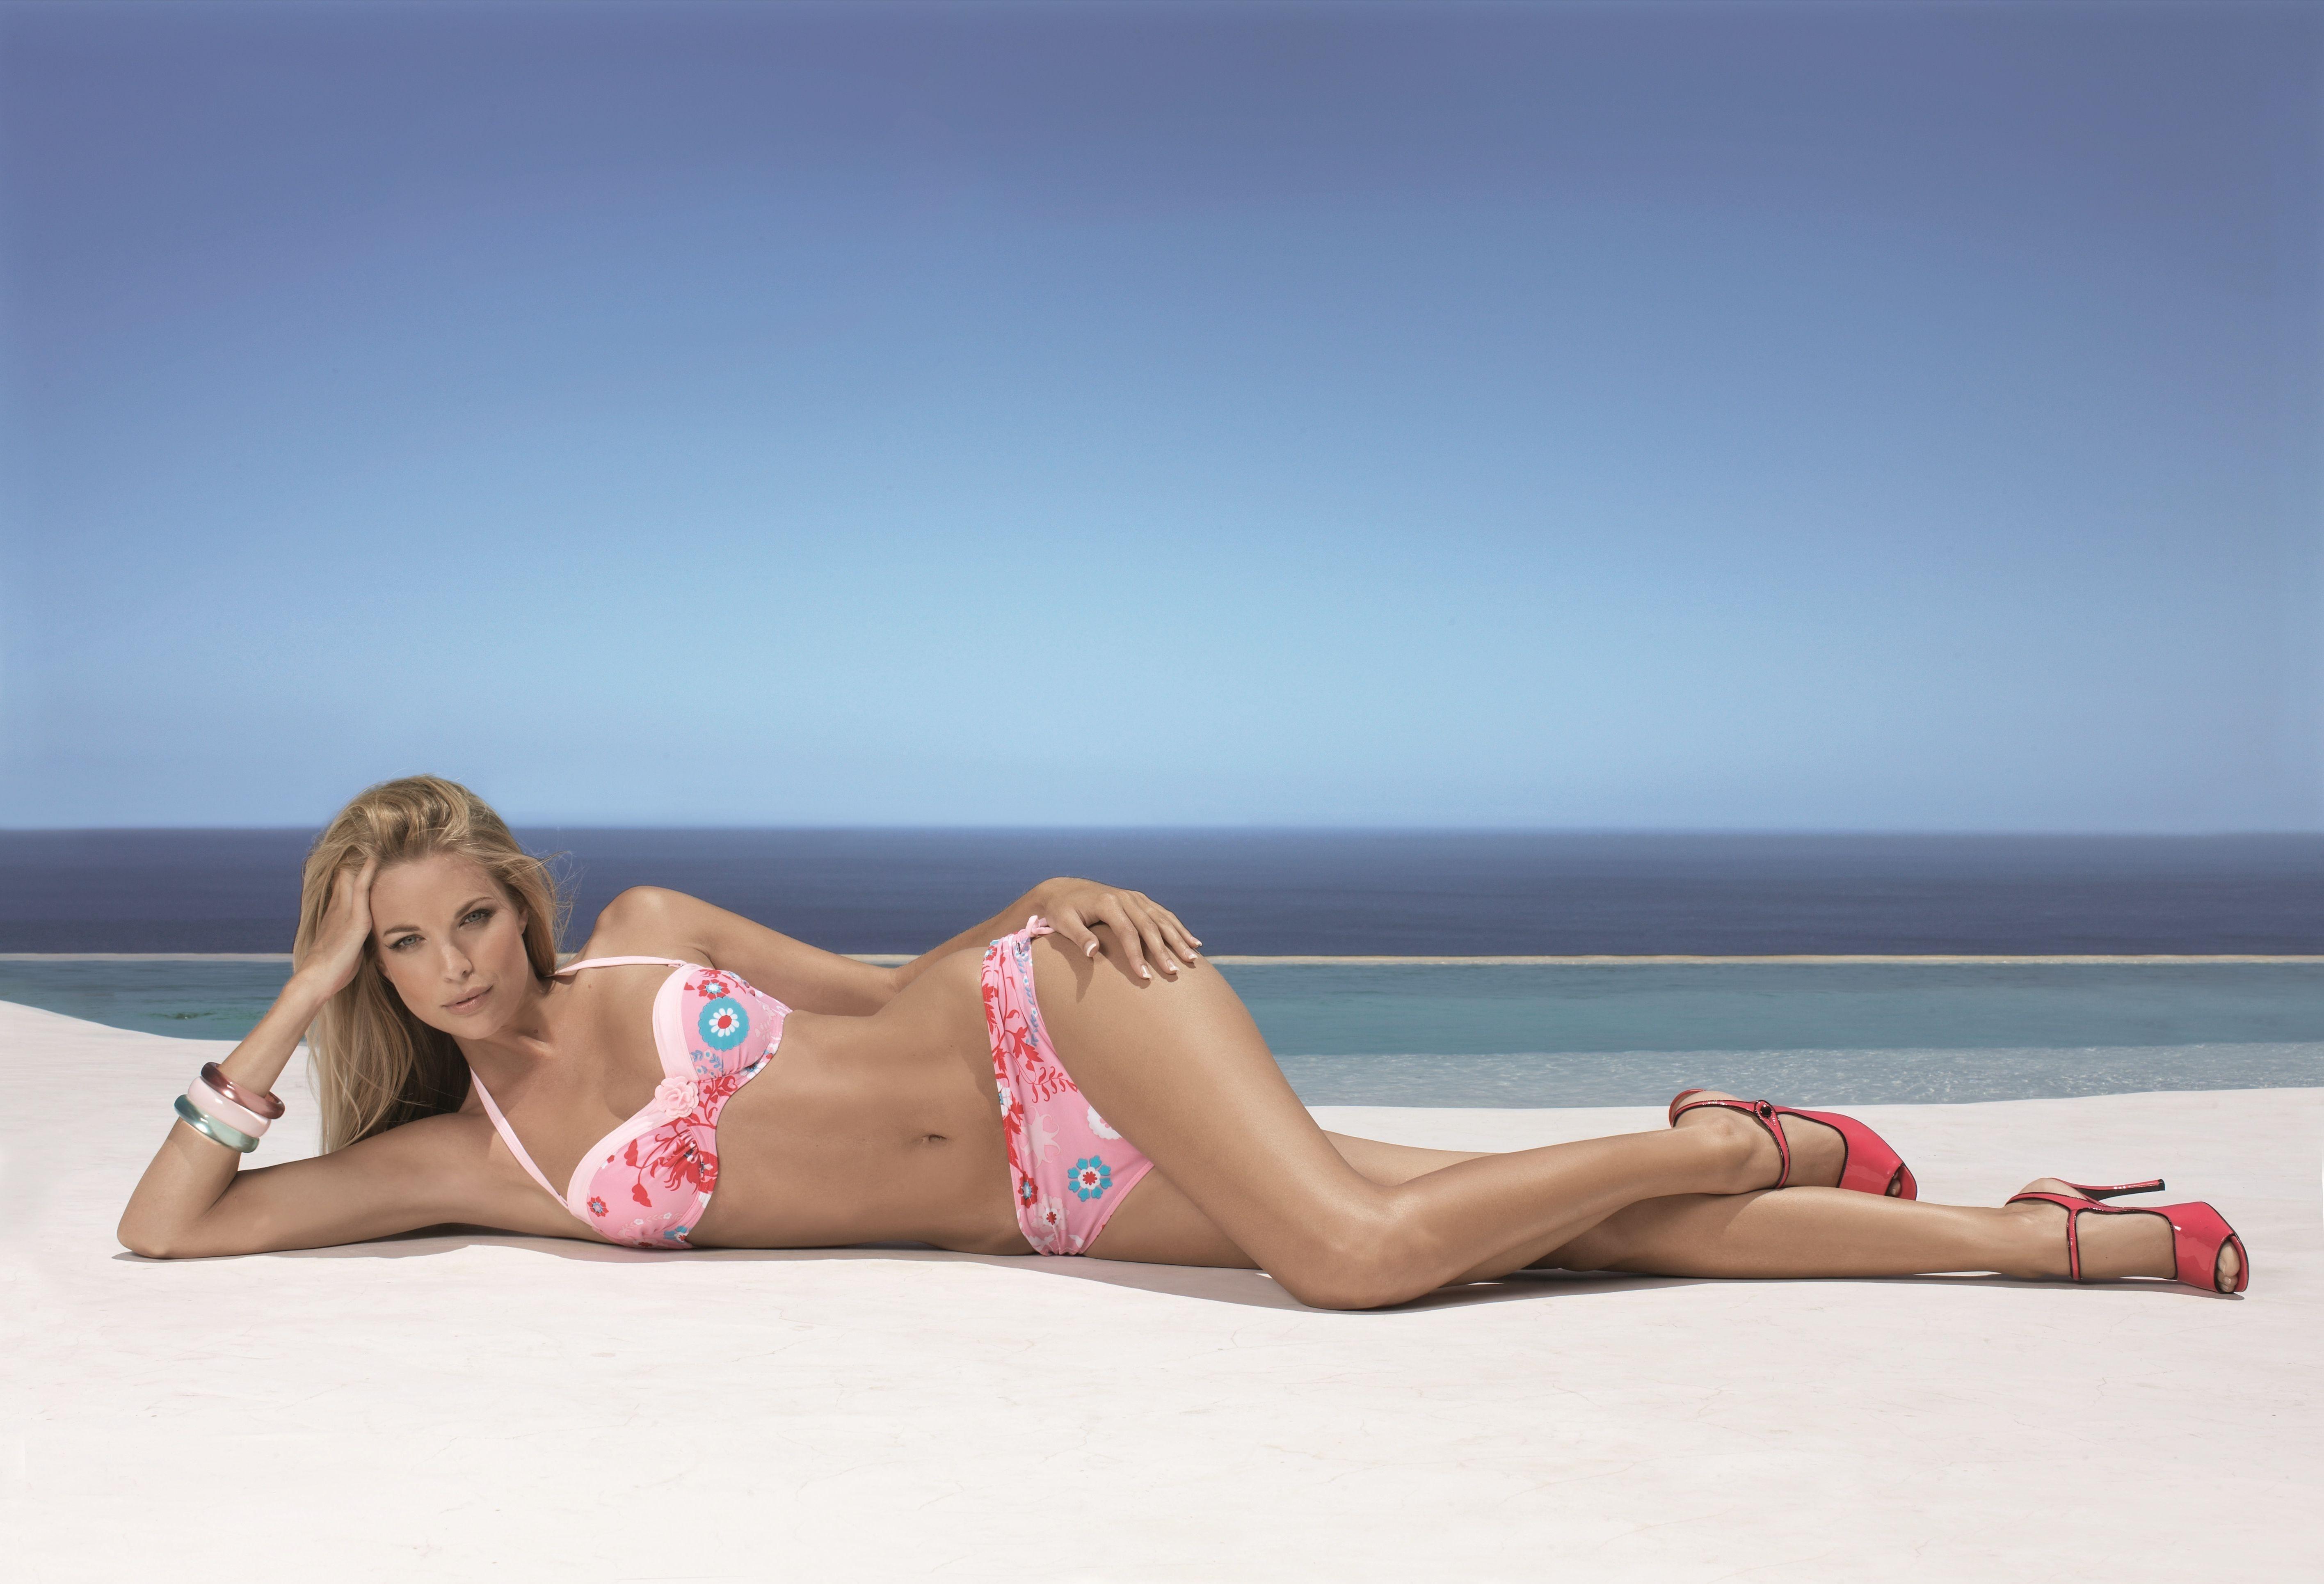 Download photo 5665x3860, blonde, bikini, brooklyn decker ...